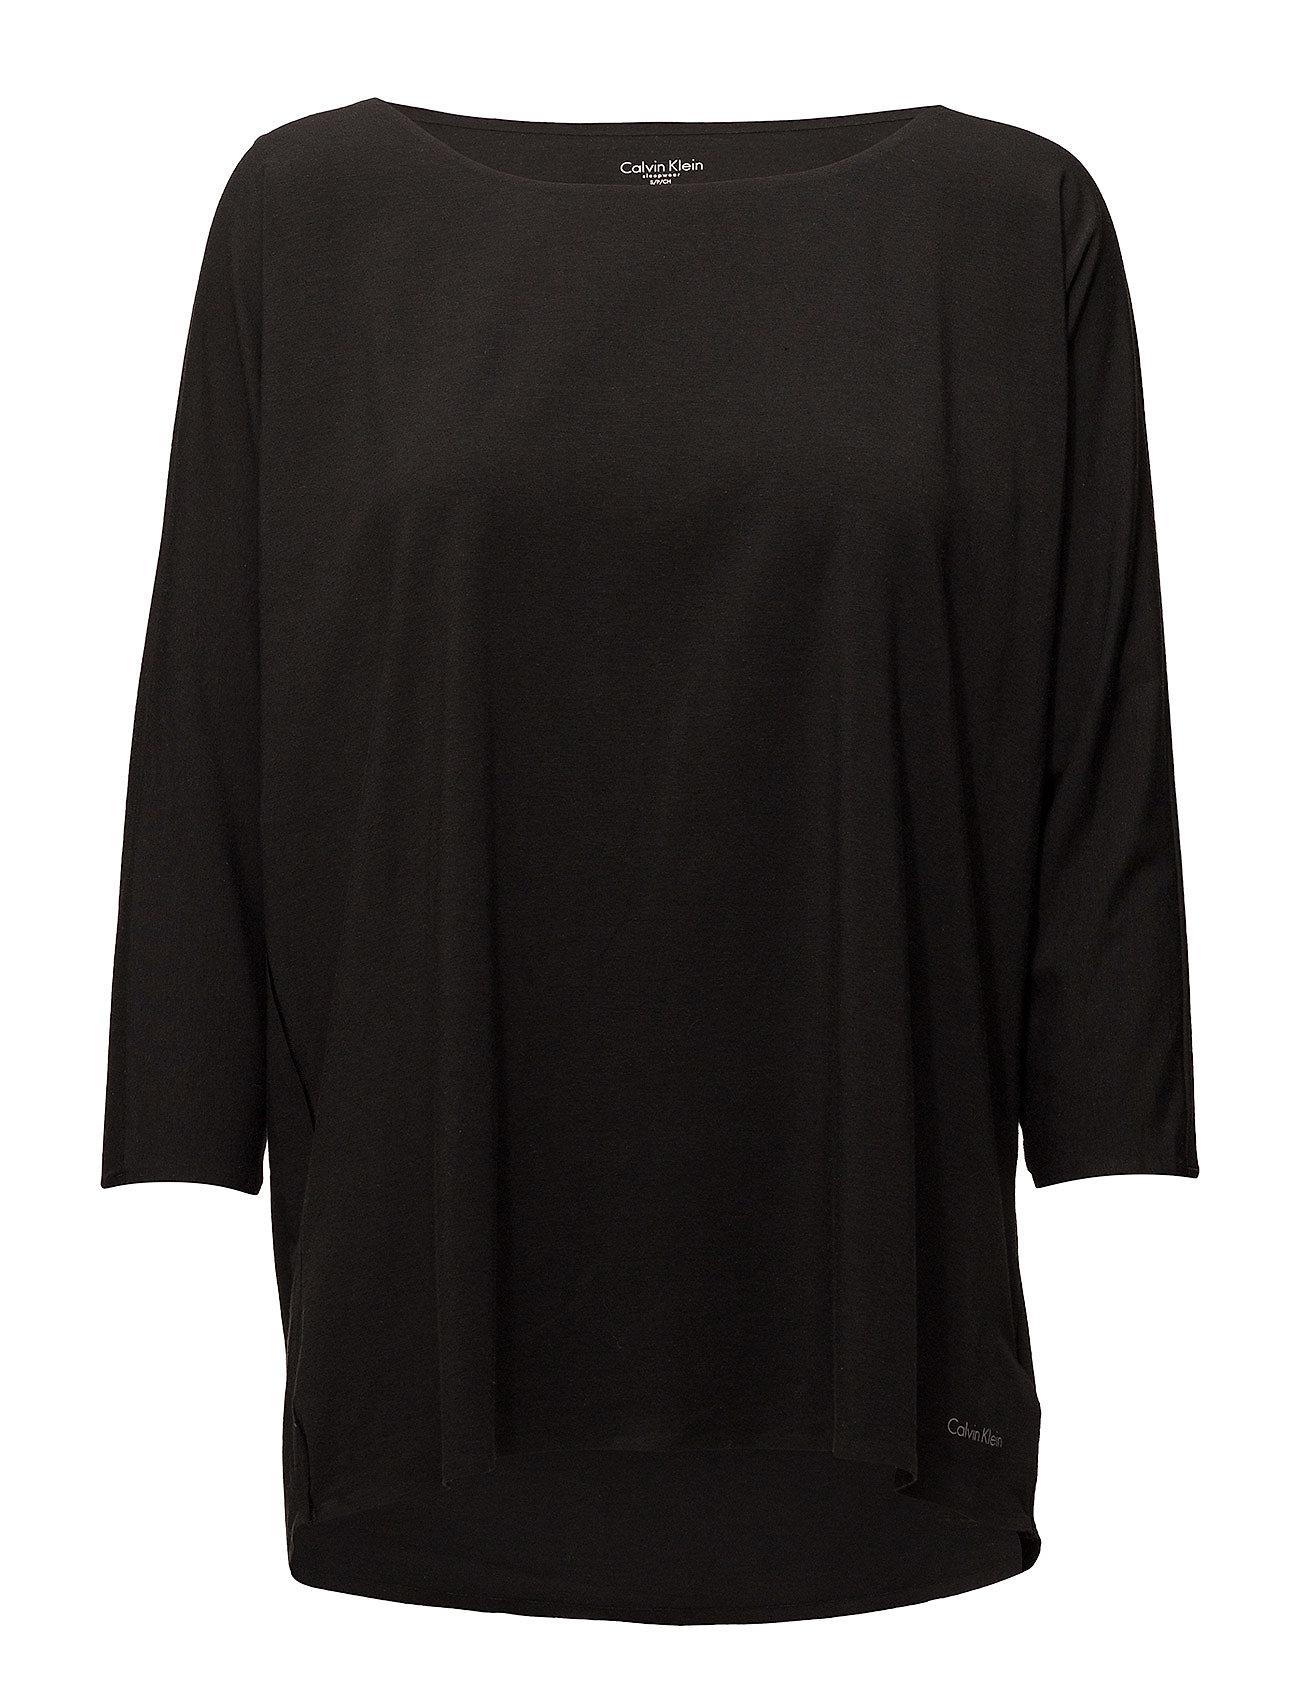 Calvin Klein 3/4 CURVE NECK - BLACK